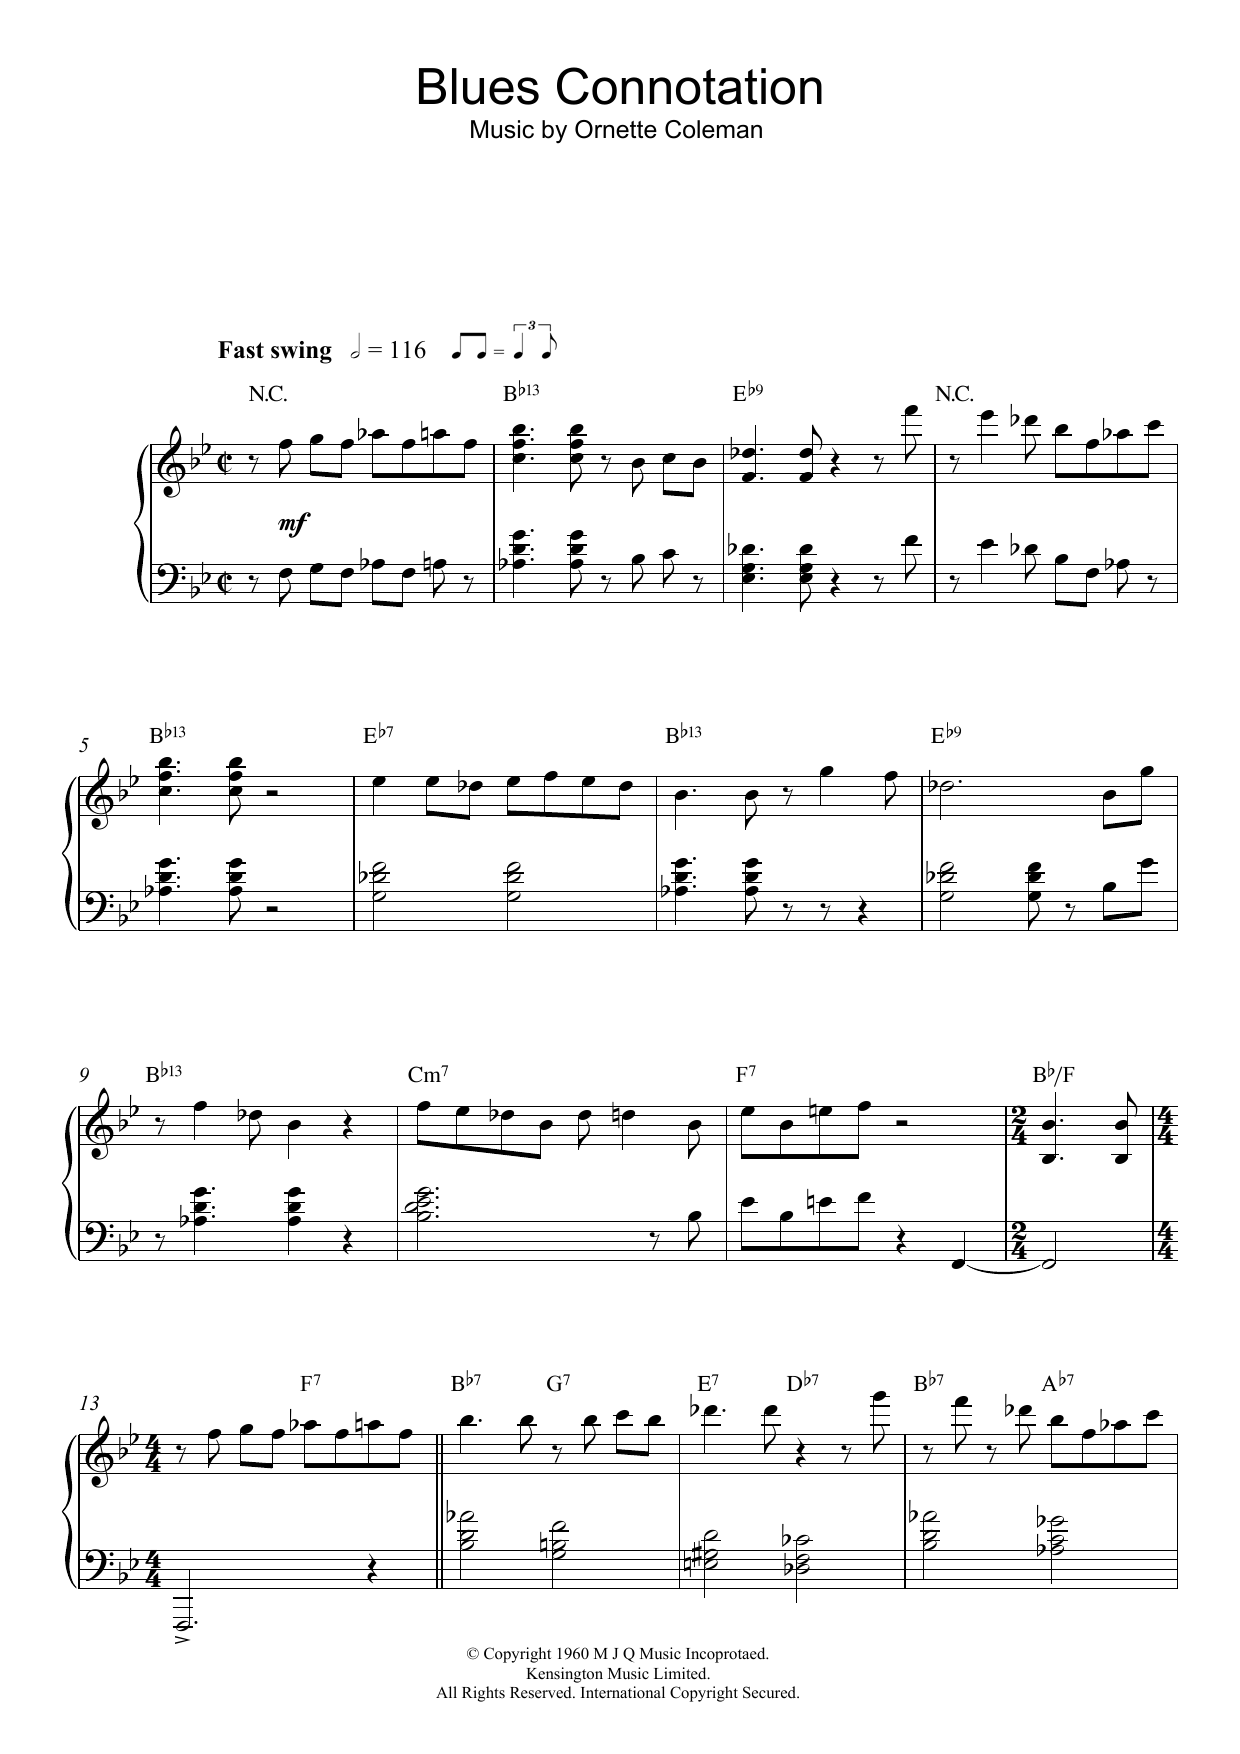 Blues Connotation sheet music